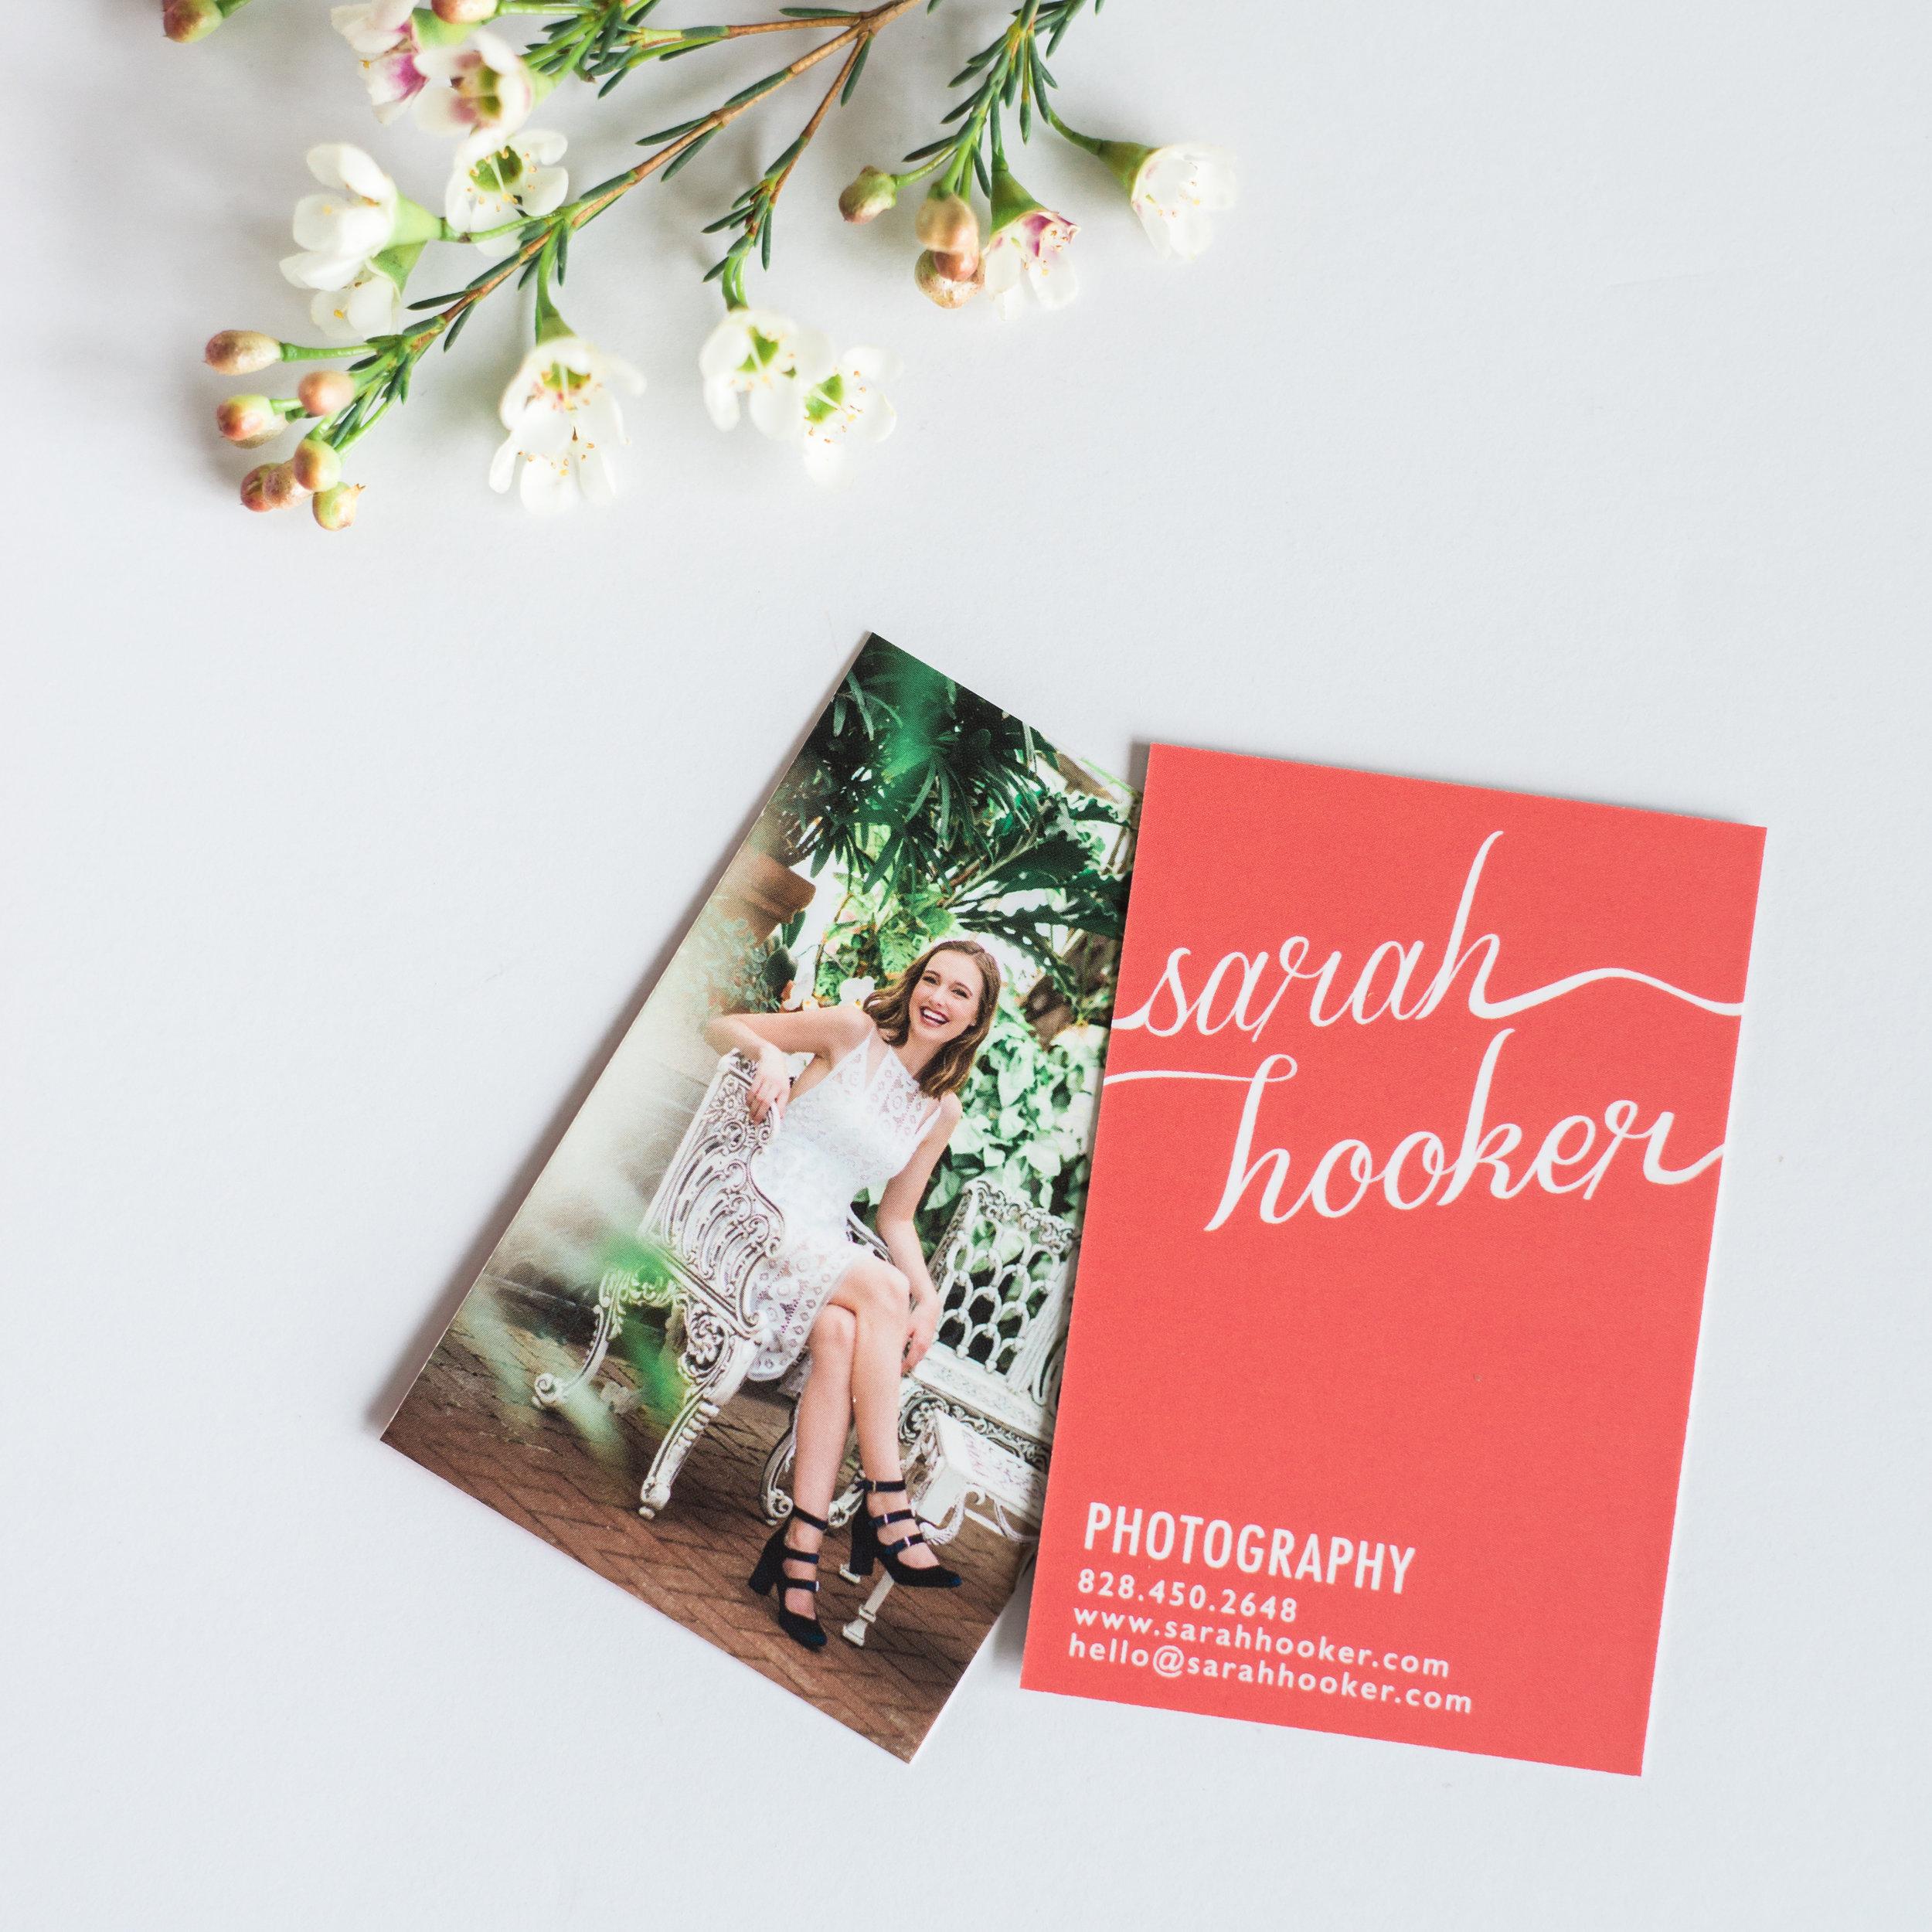 Sarah Hooker Photography Moo Business Cards